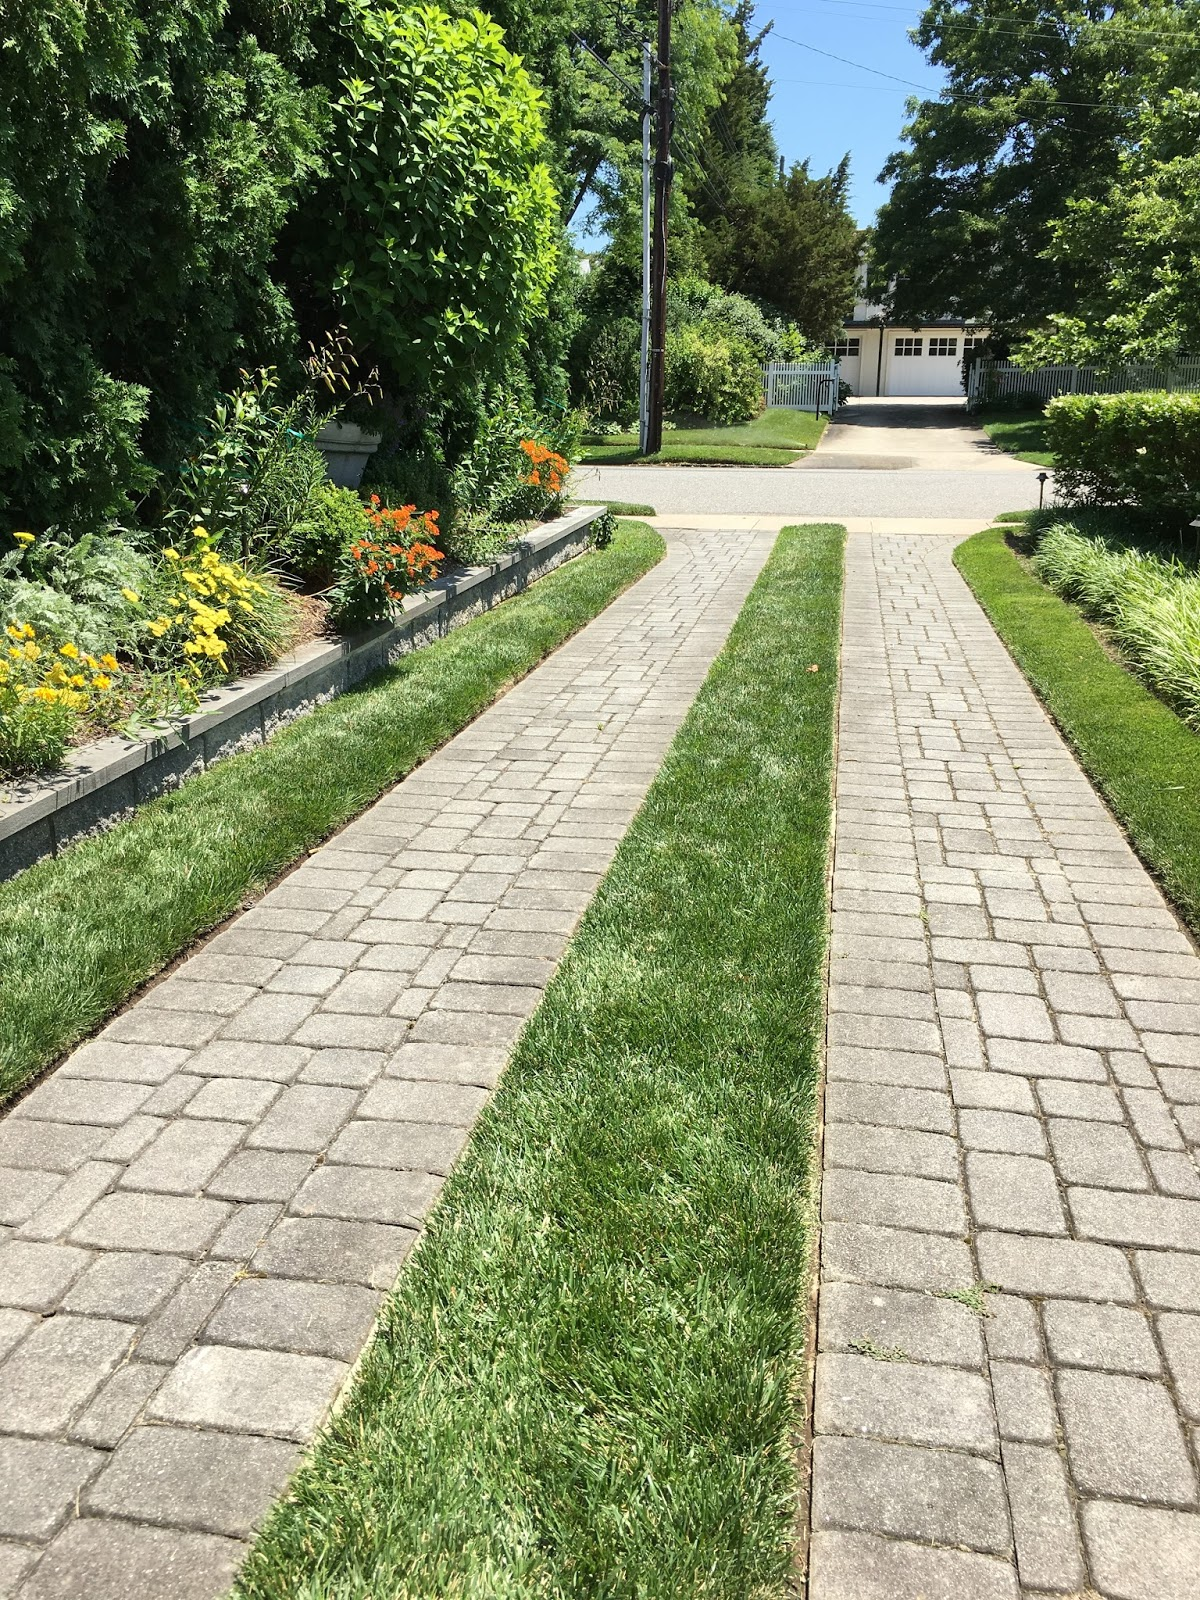 Ribbon driveway with pavers